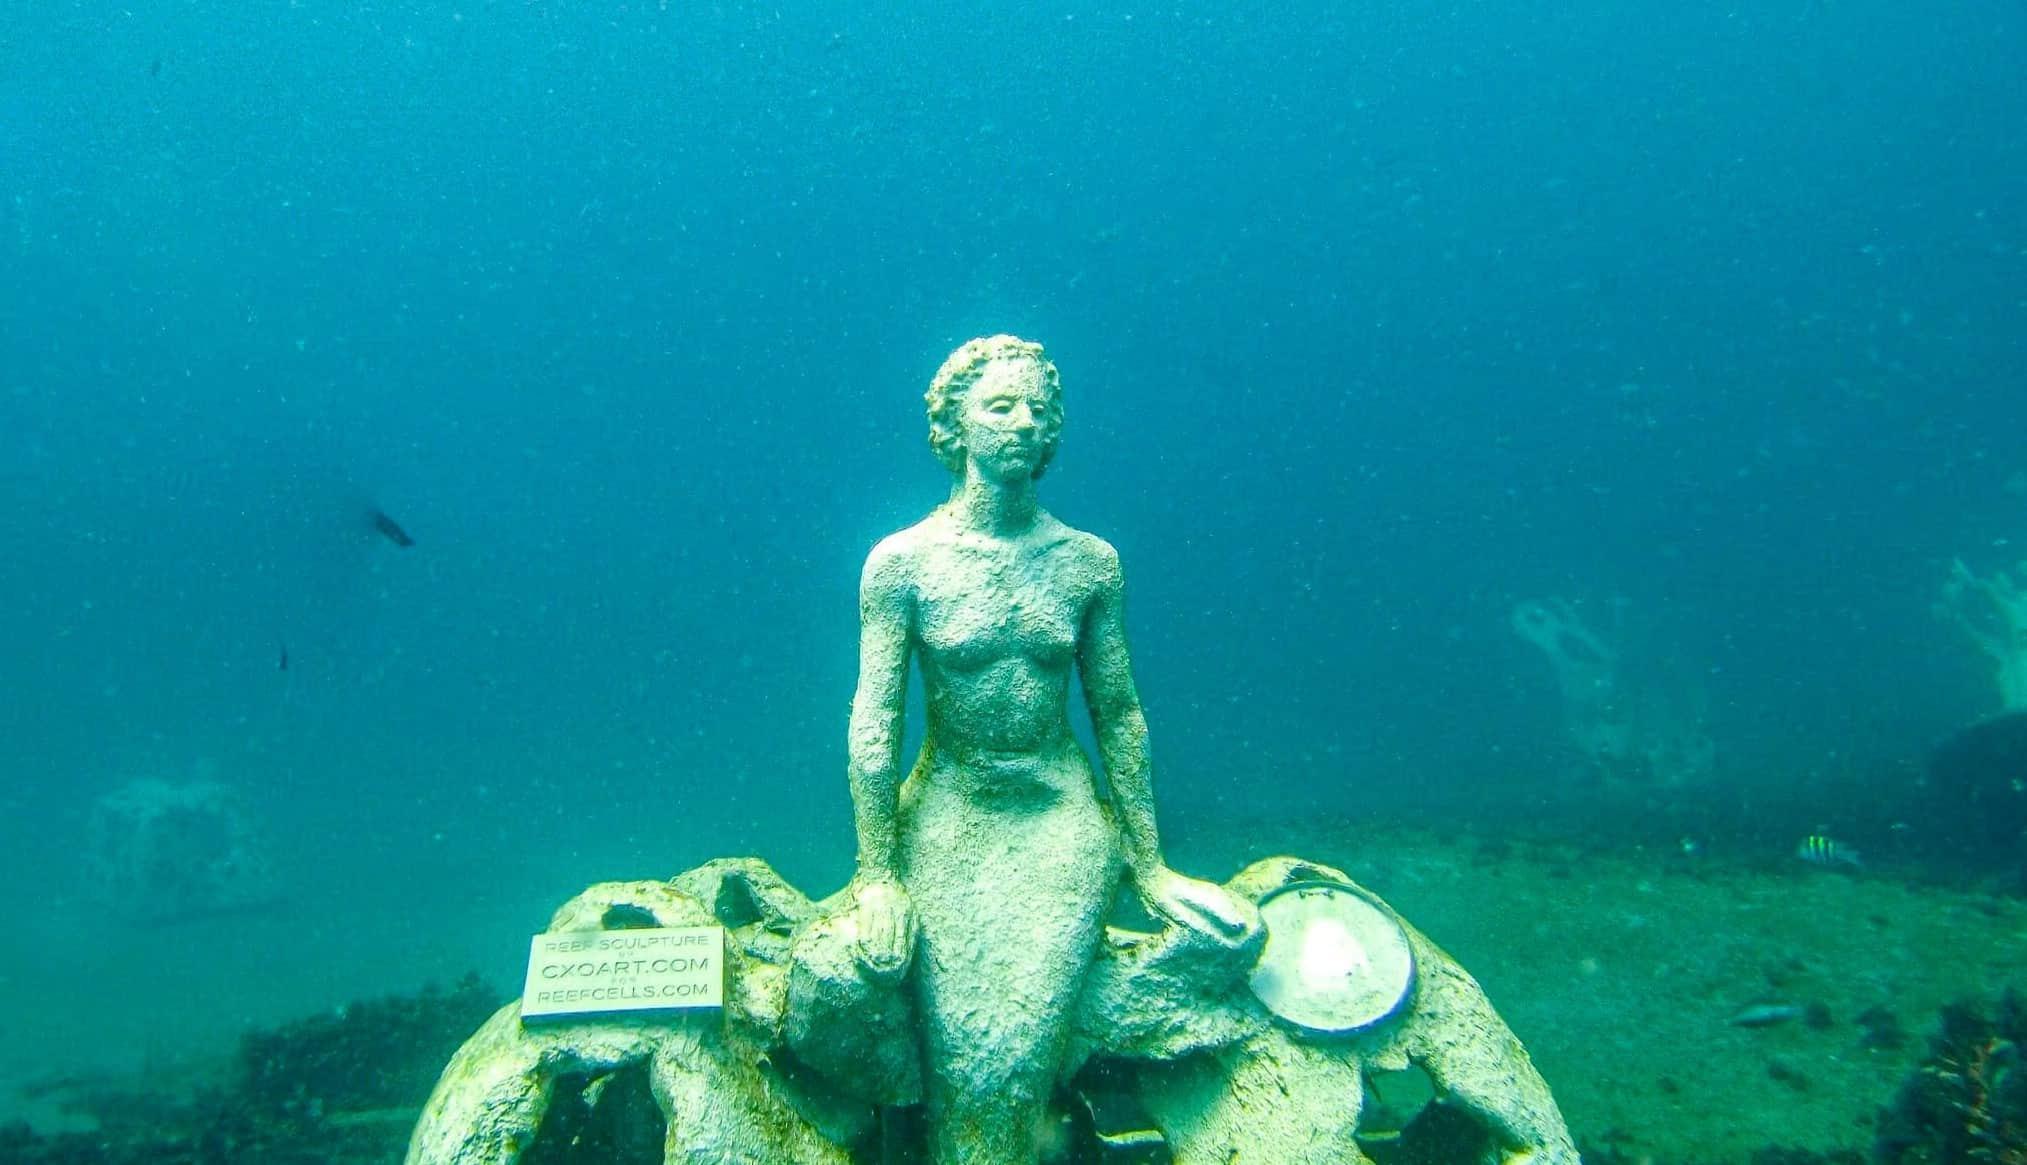 Este proyecto planea construir 1000 esculturas de sirenas para crear un arrecife artificial